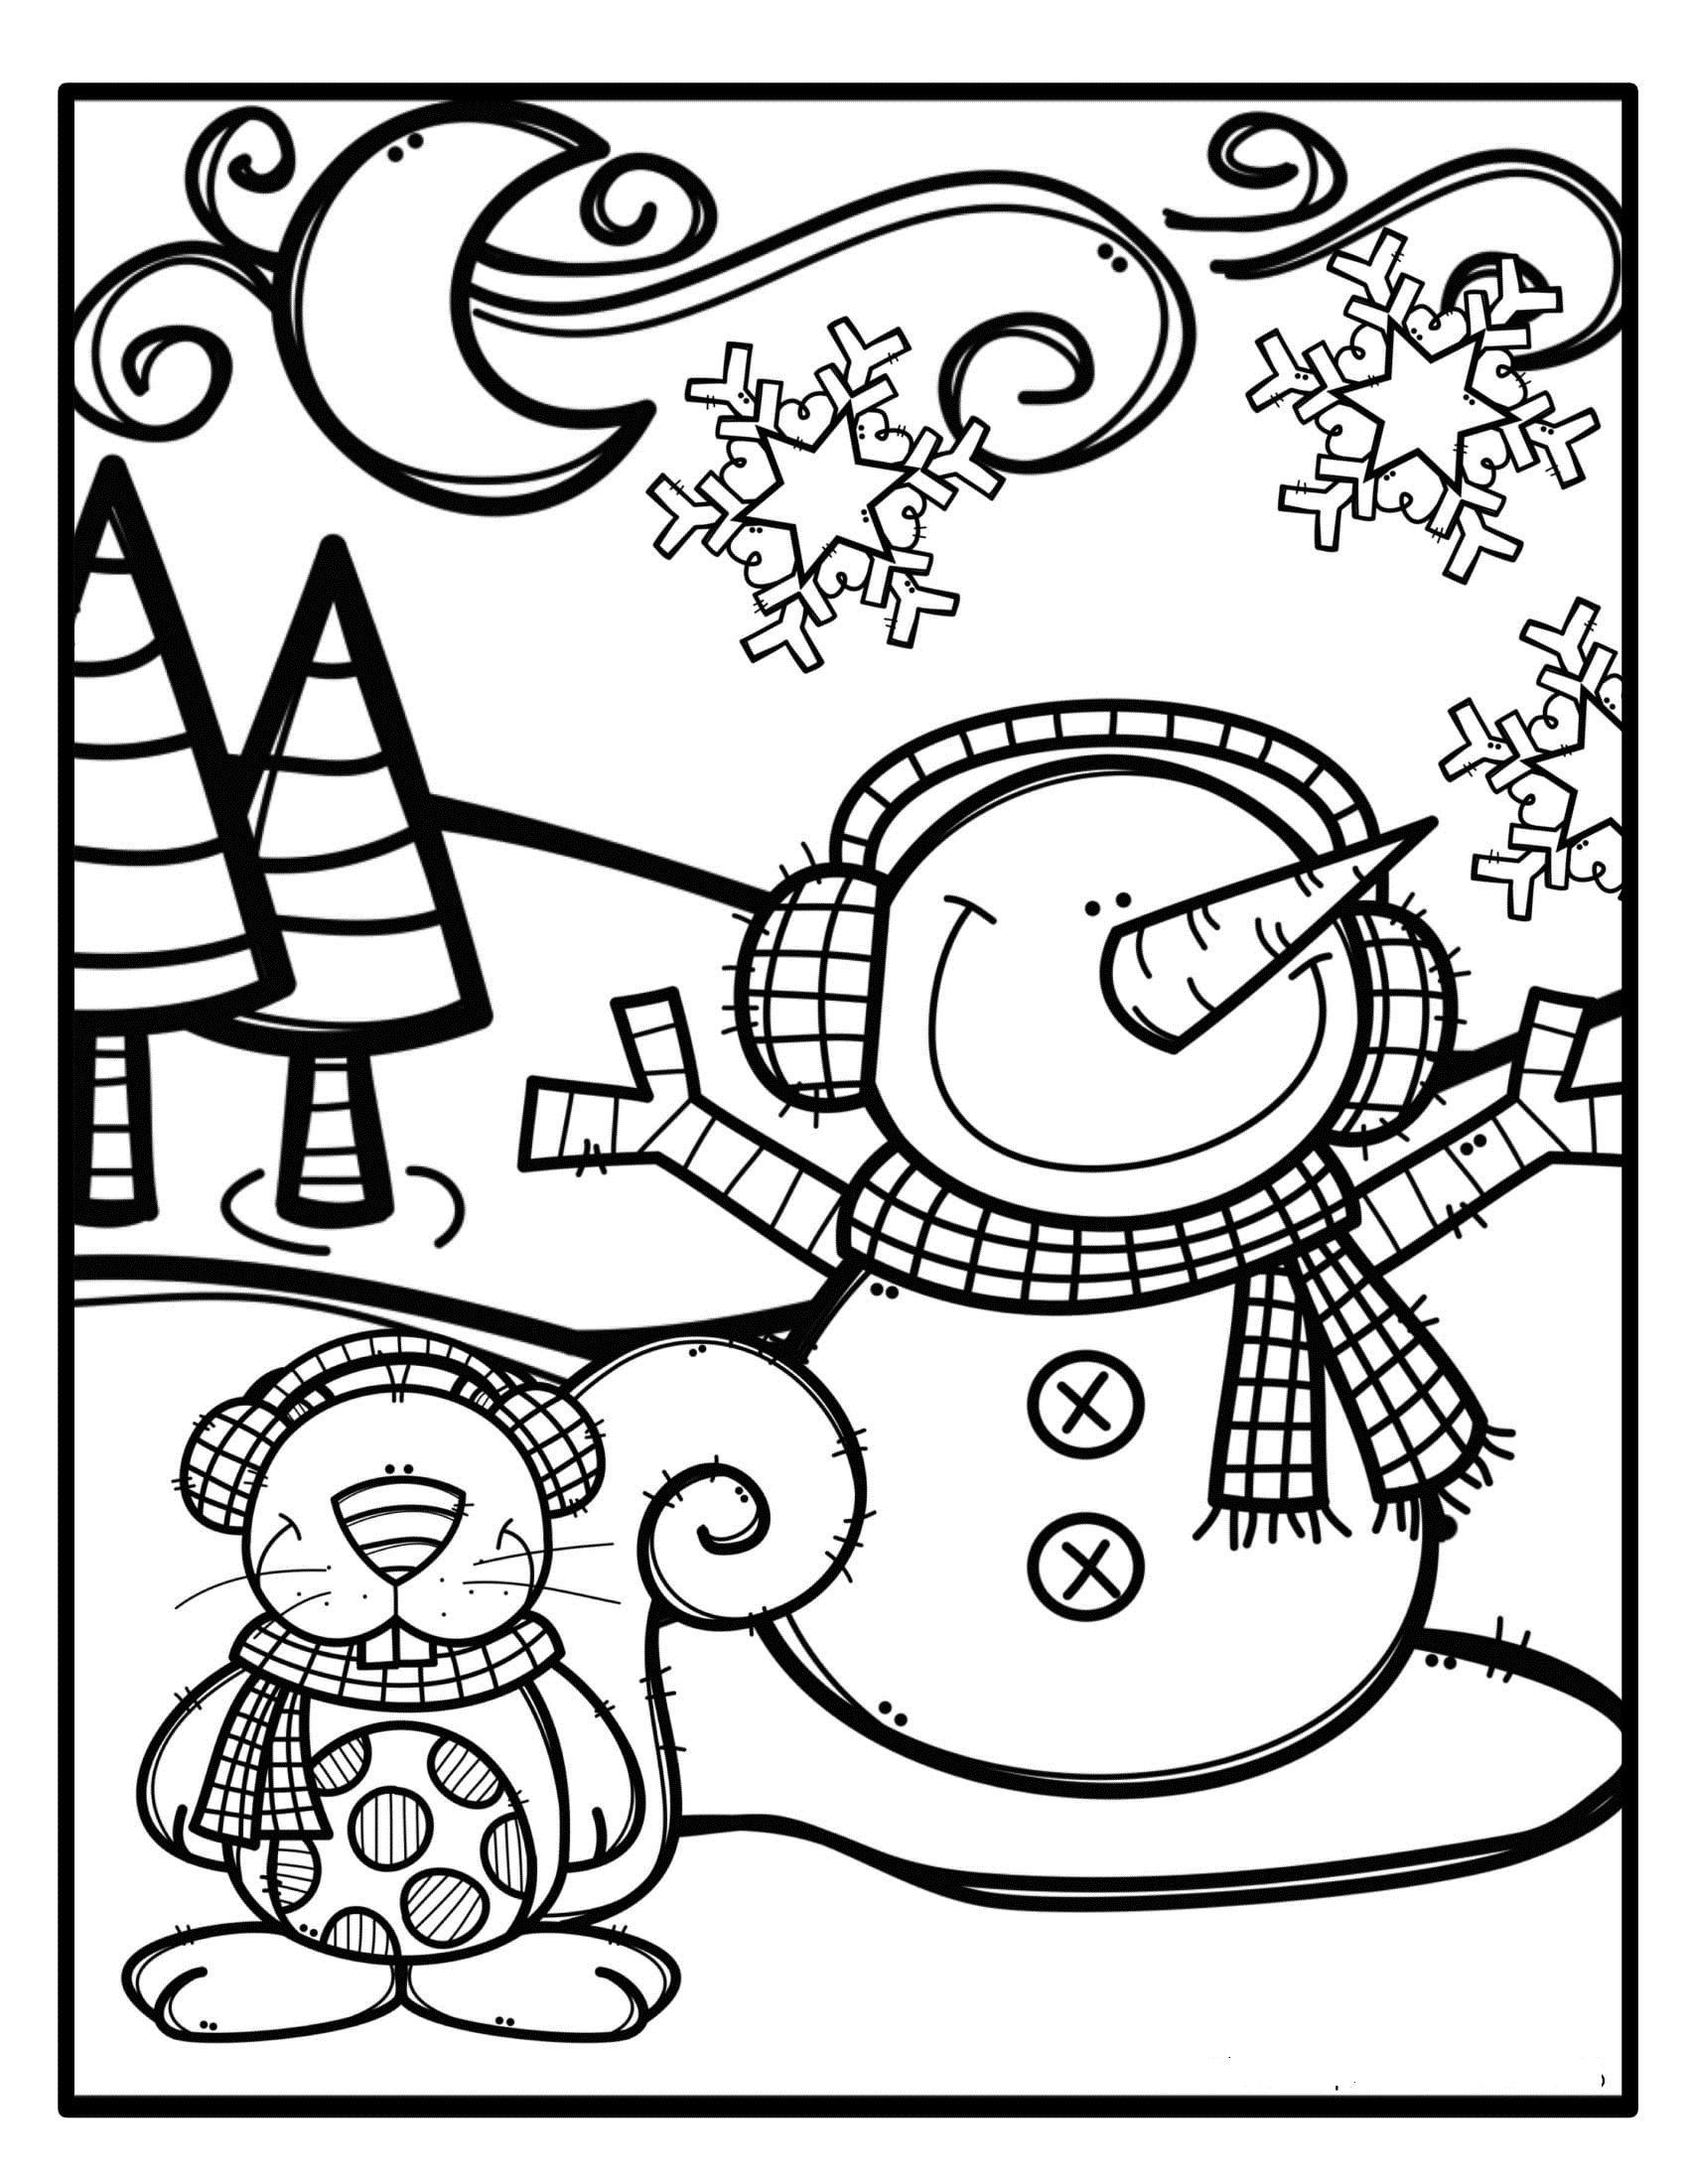 kış boyama | etkinlikasigi working pages | Pinterest | Colorear ...